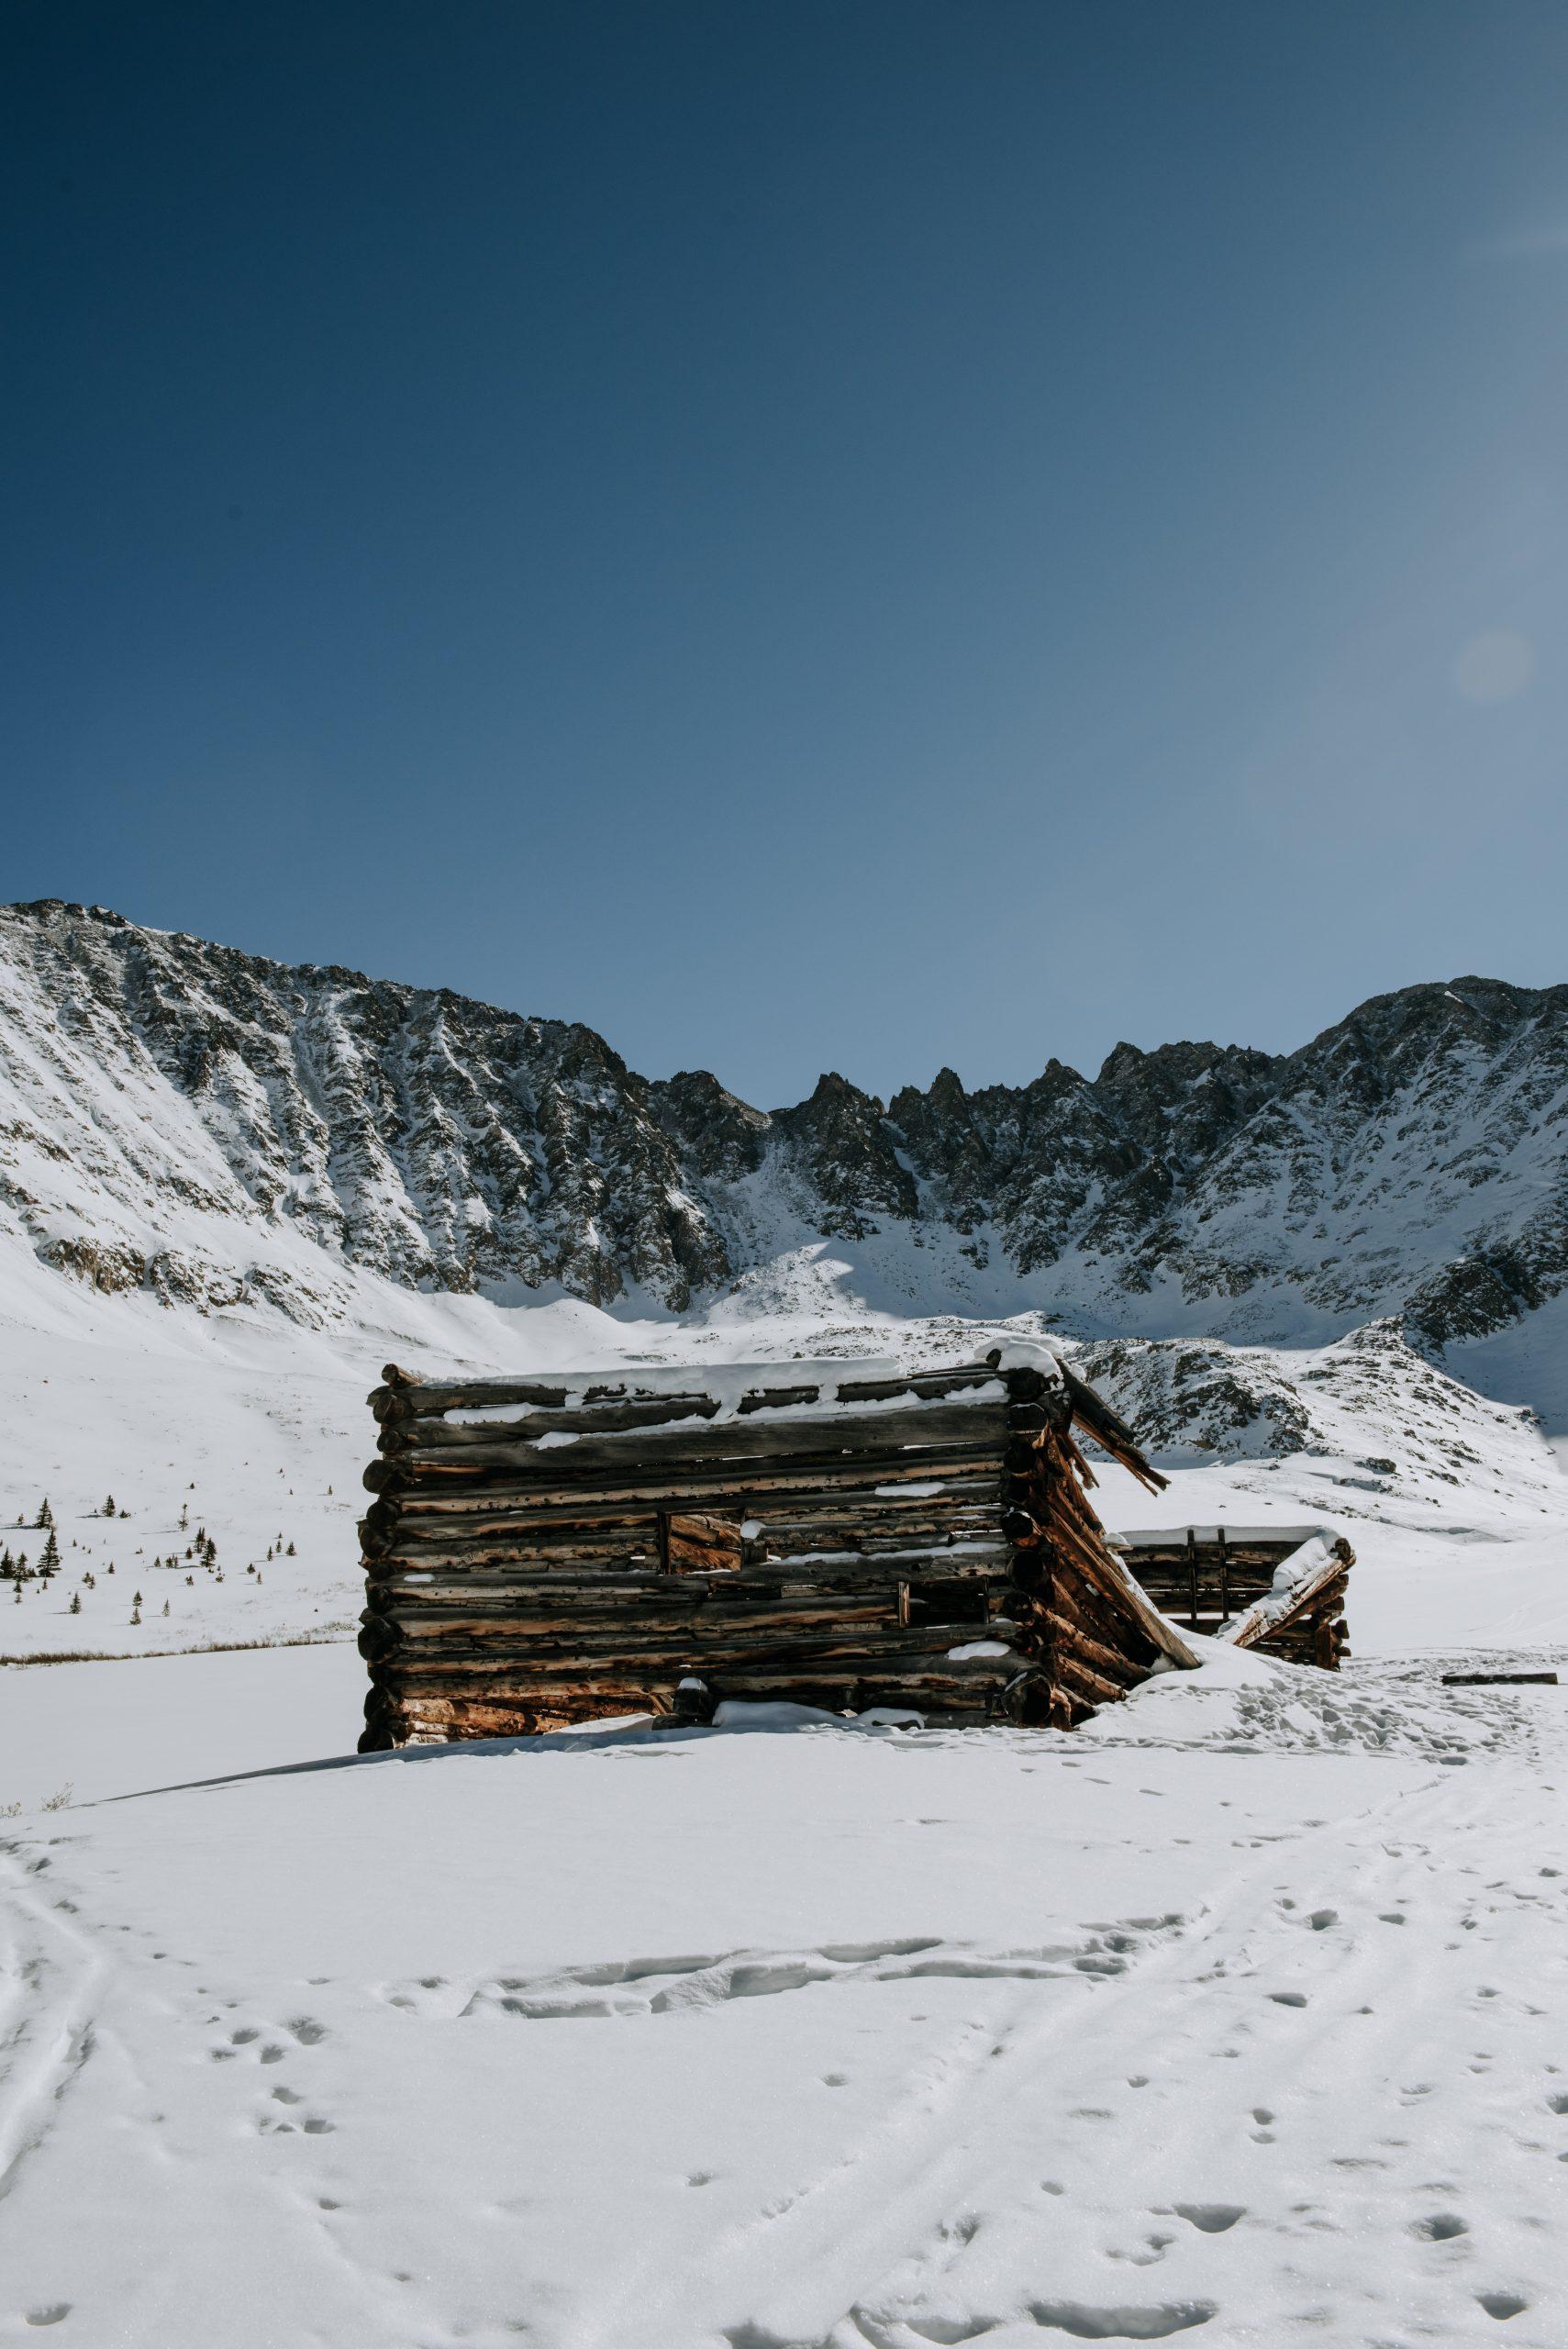 Mayflower Gulch in Colorado